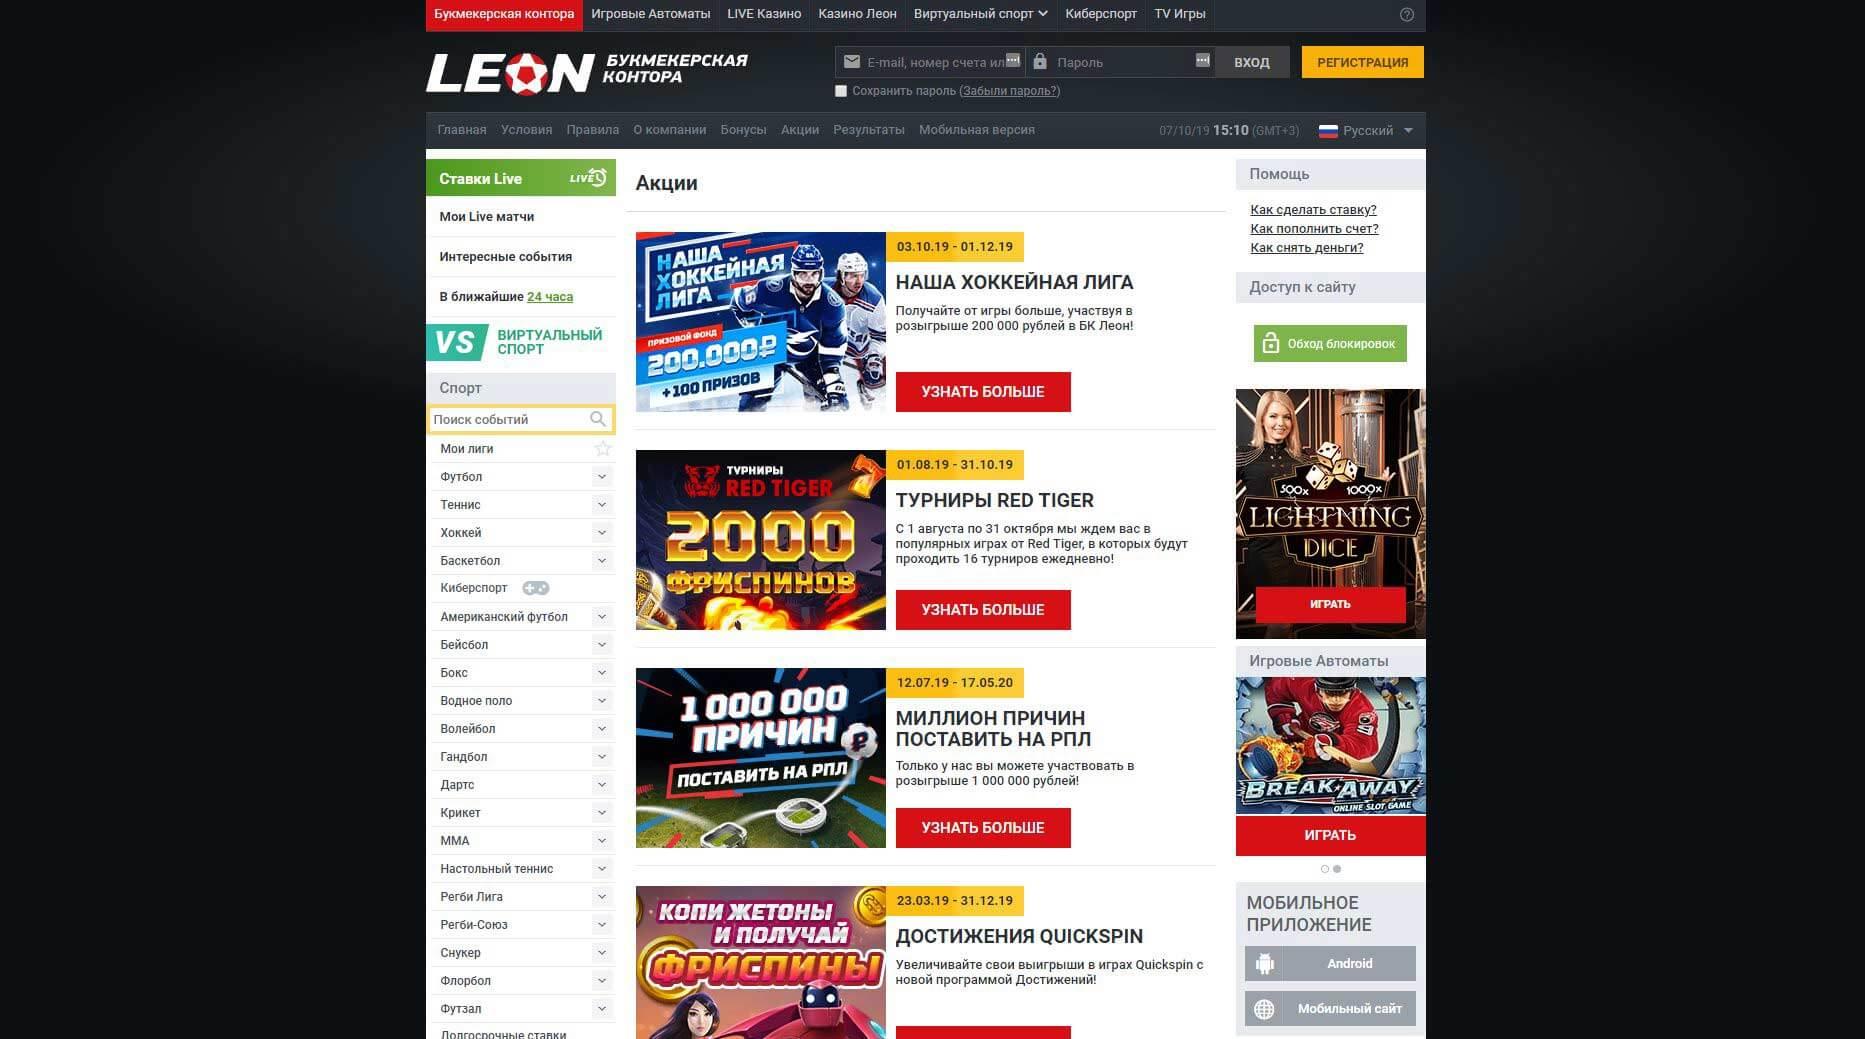 bonusy i aktsii Leonbets